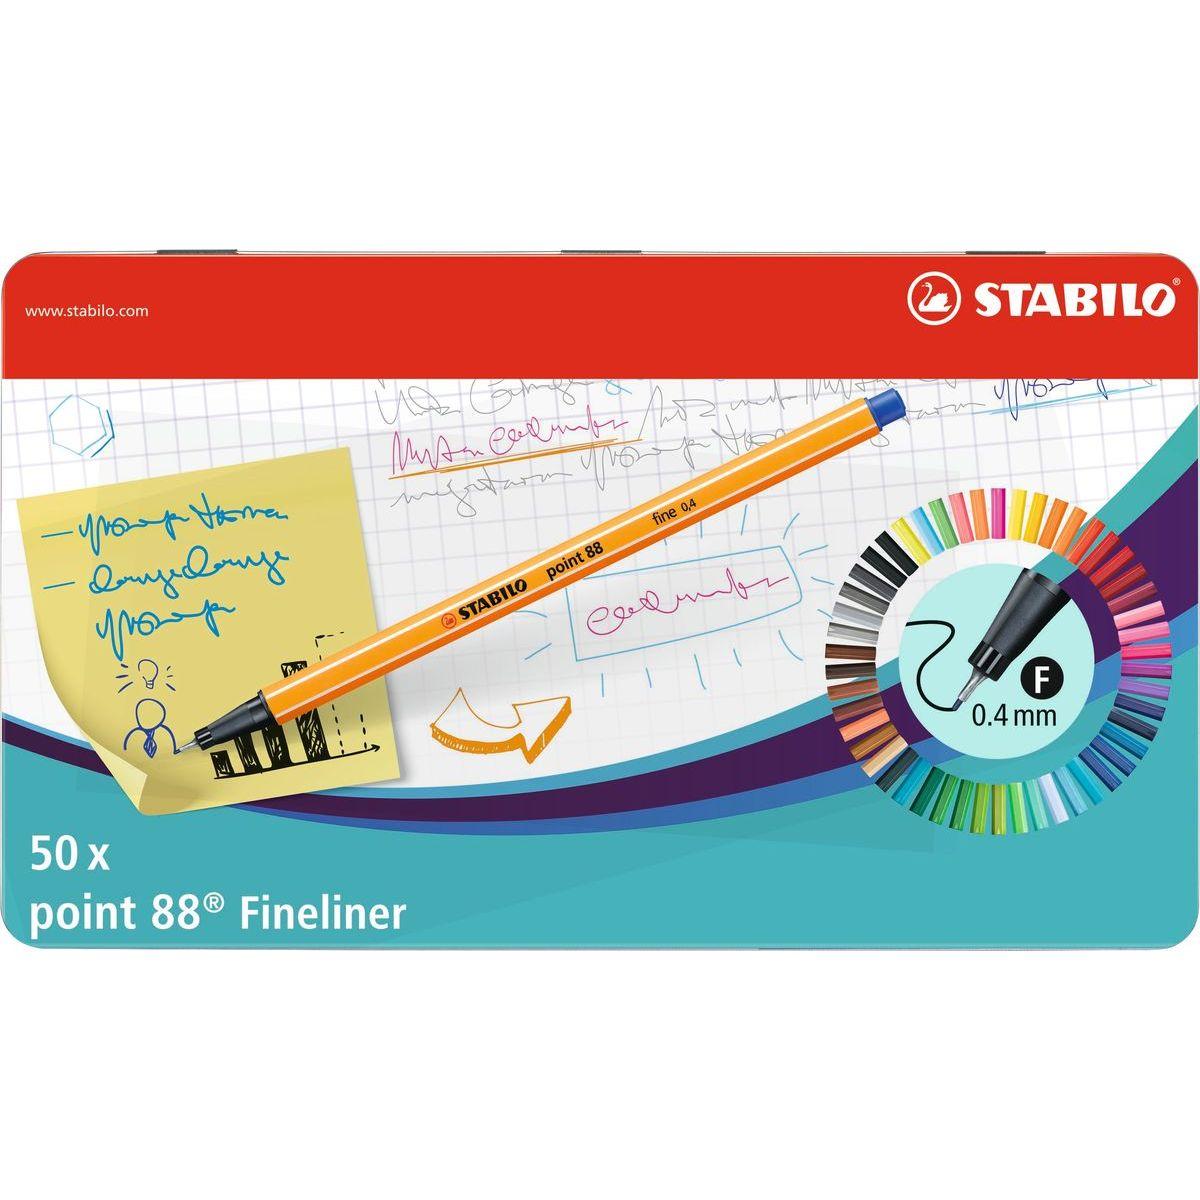 Stabilo point 88 50 ks metal box